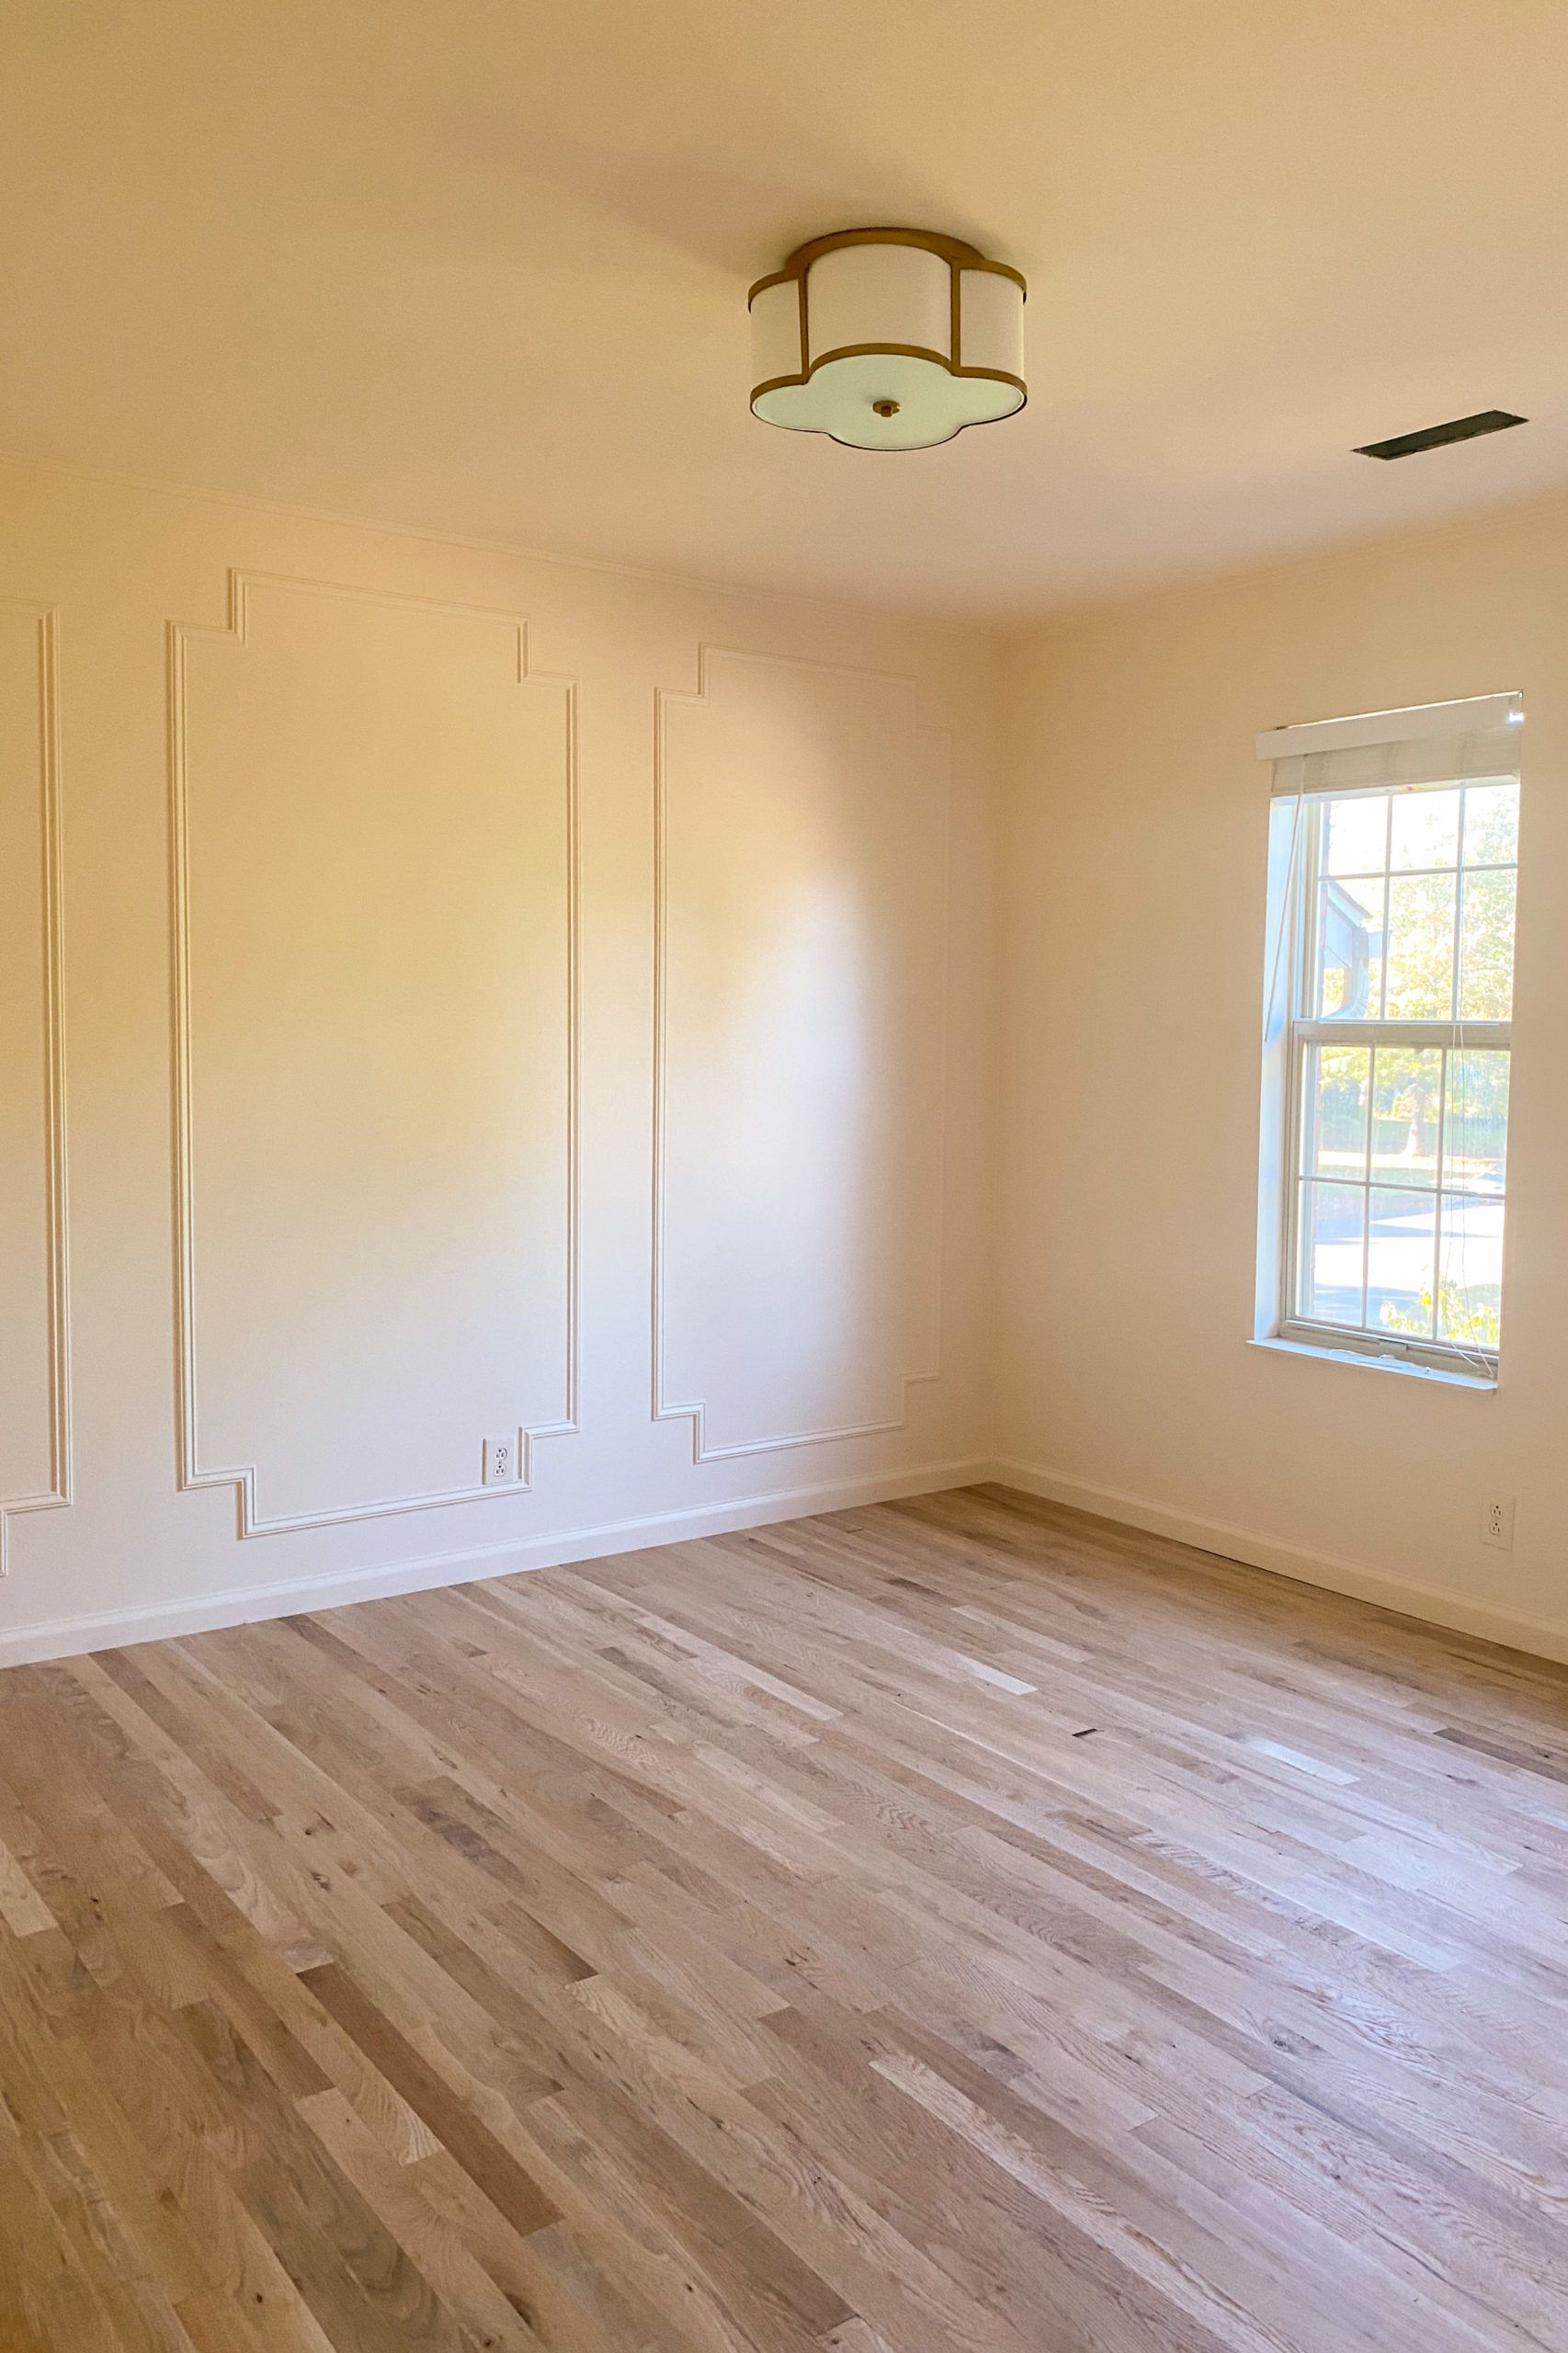 white oak floors, peach paint walls